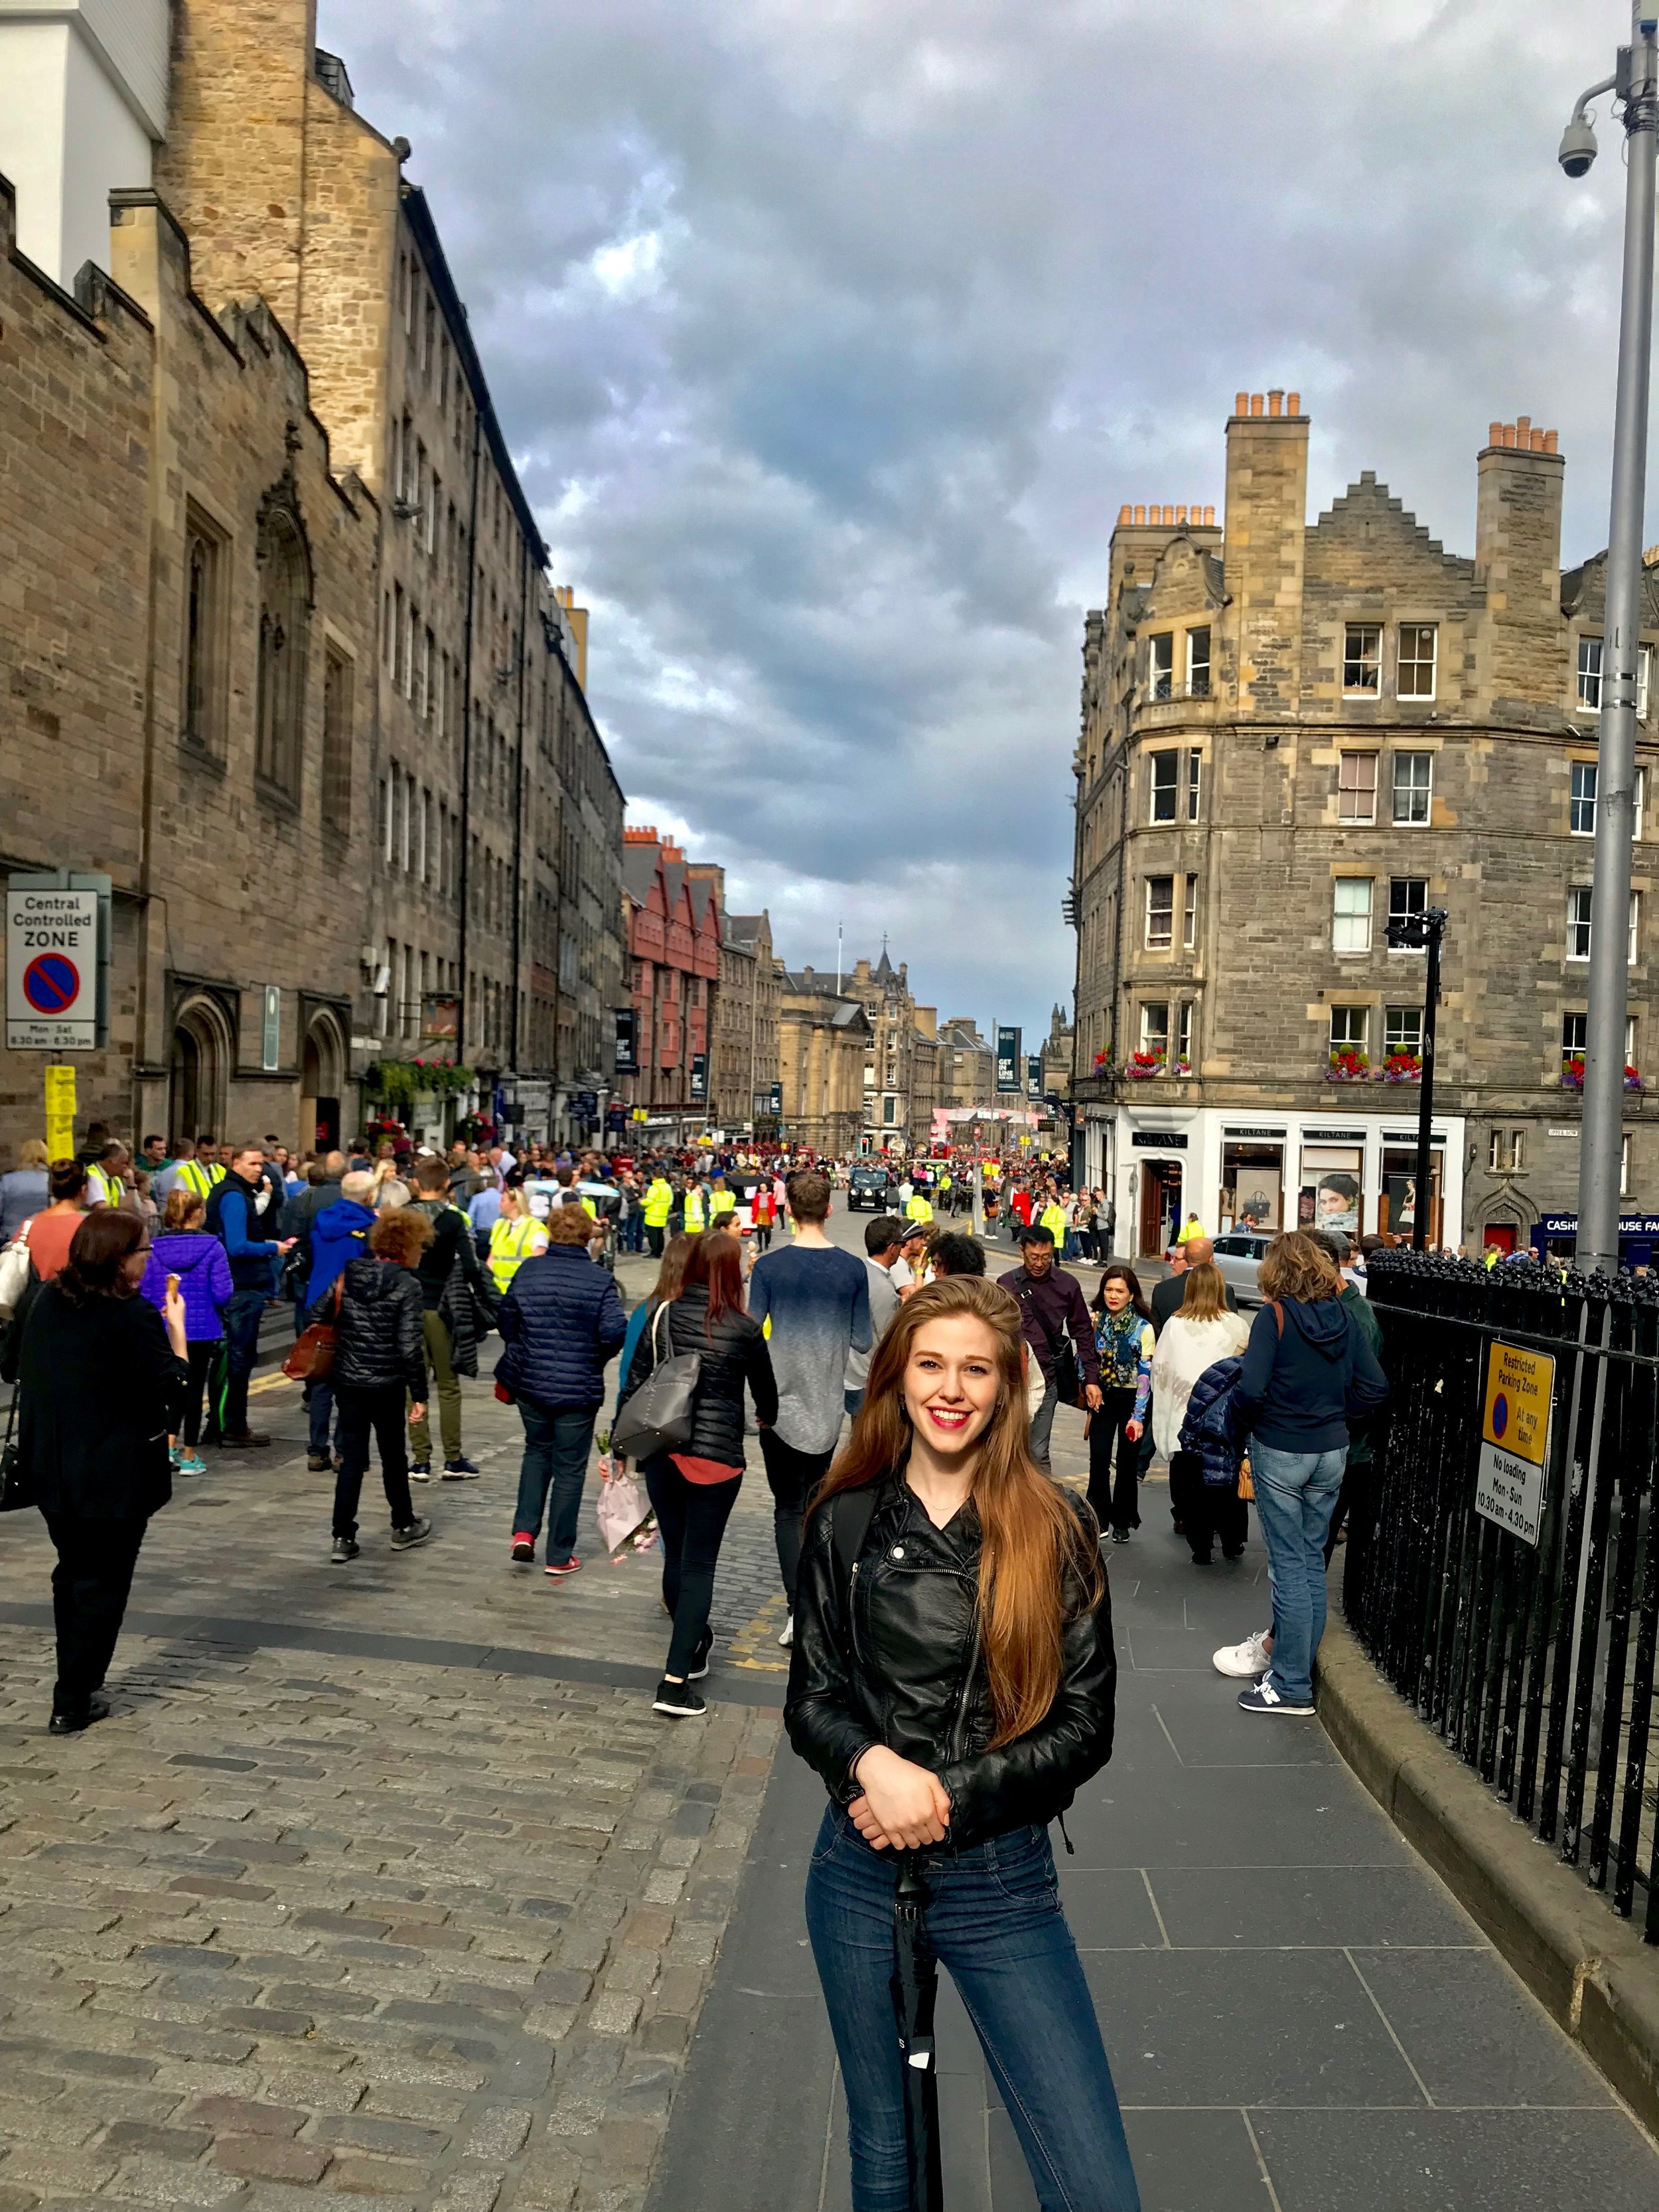 My First Edinburgh Fringe Experience! - - 4.5 days.-15 shows seen.- Lots of Rain.- Amazing experience.-Gotta go back next year!